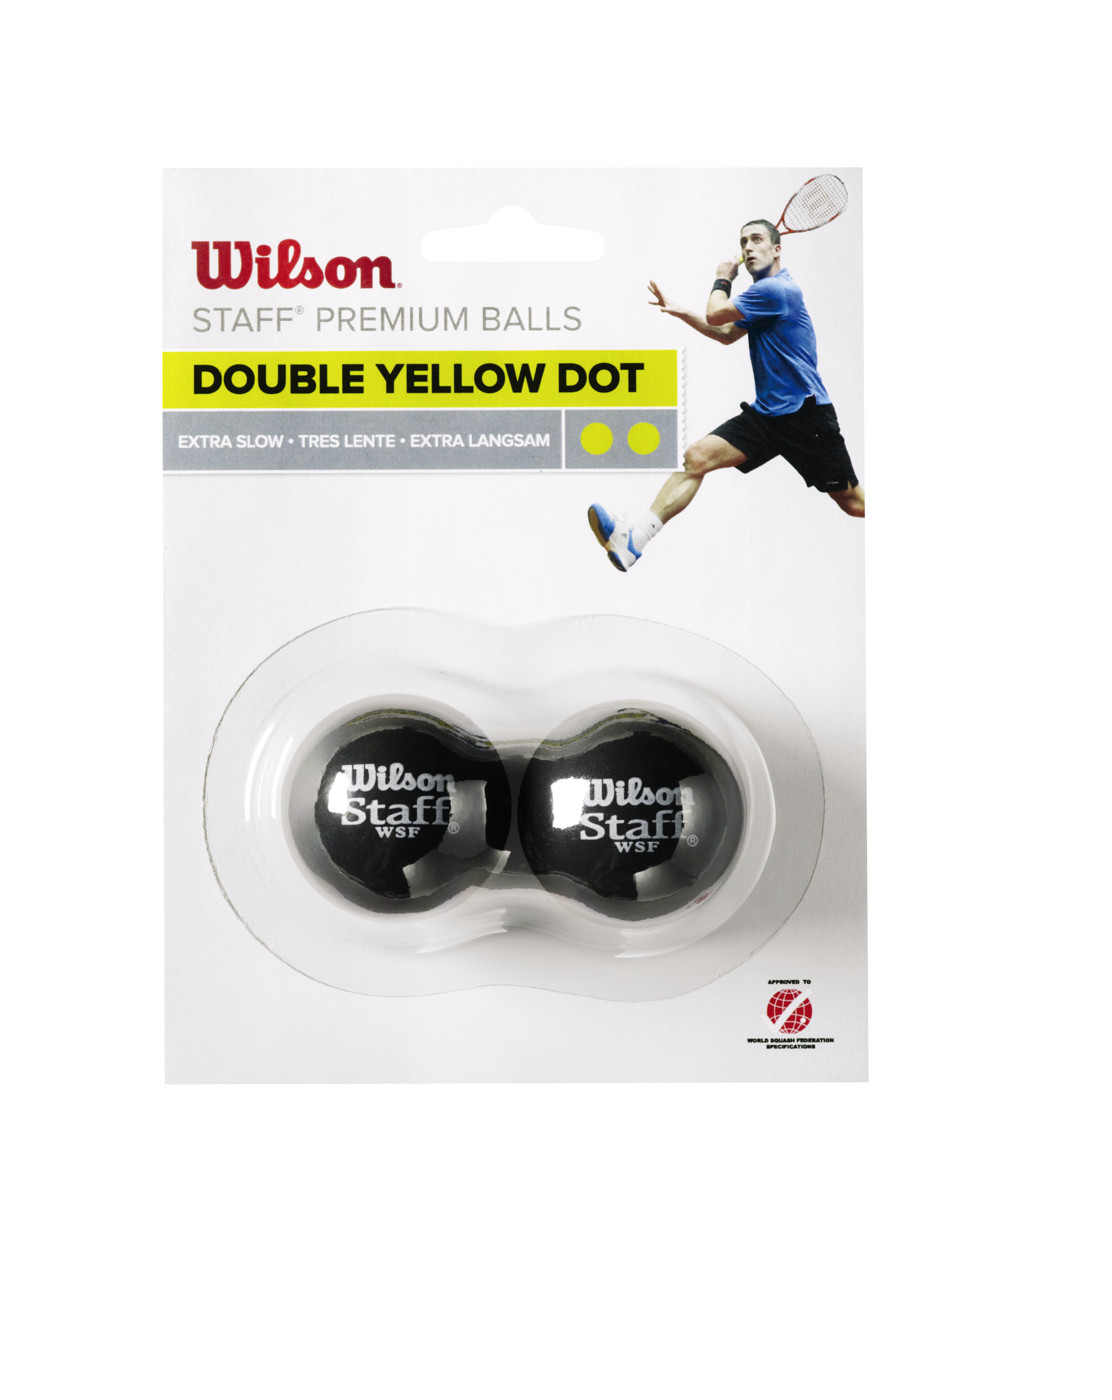 WILSON STAFF SQUASH 2 BALL DBL YE DOT